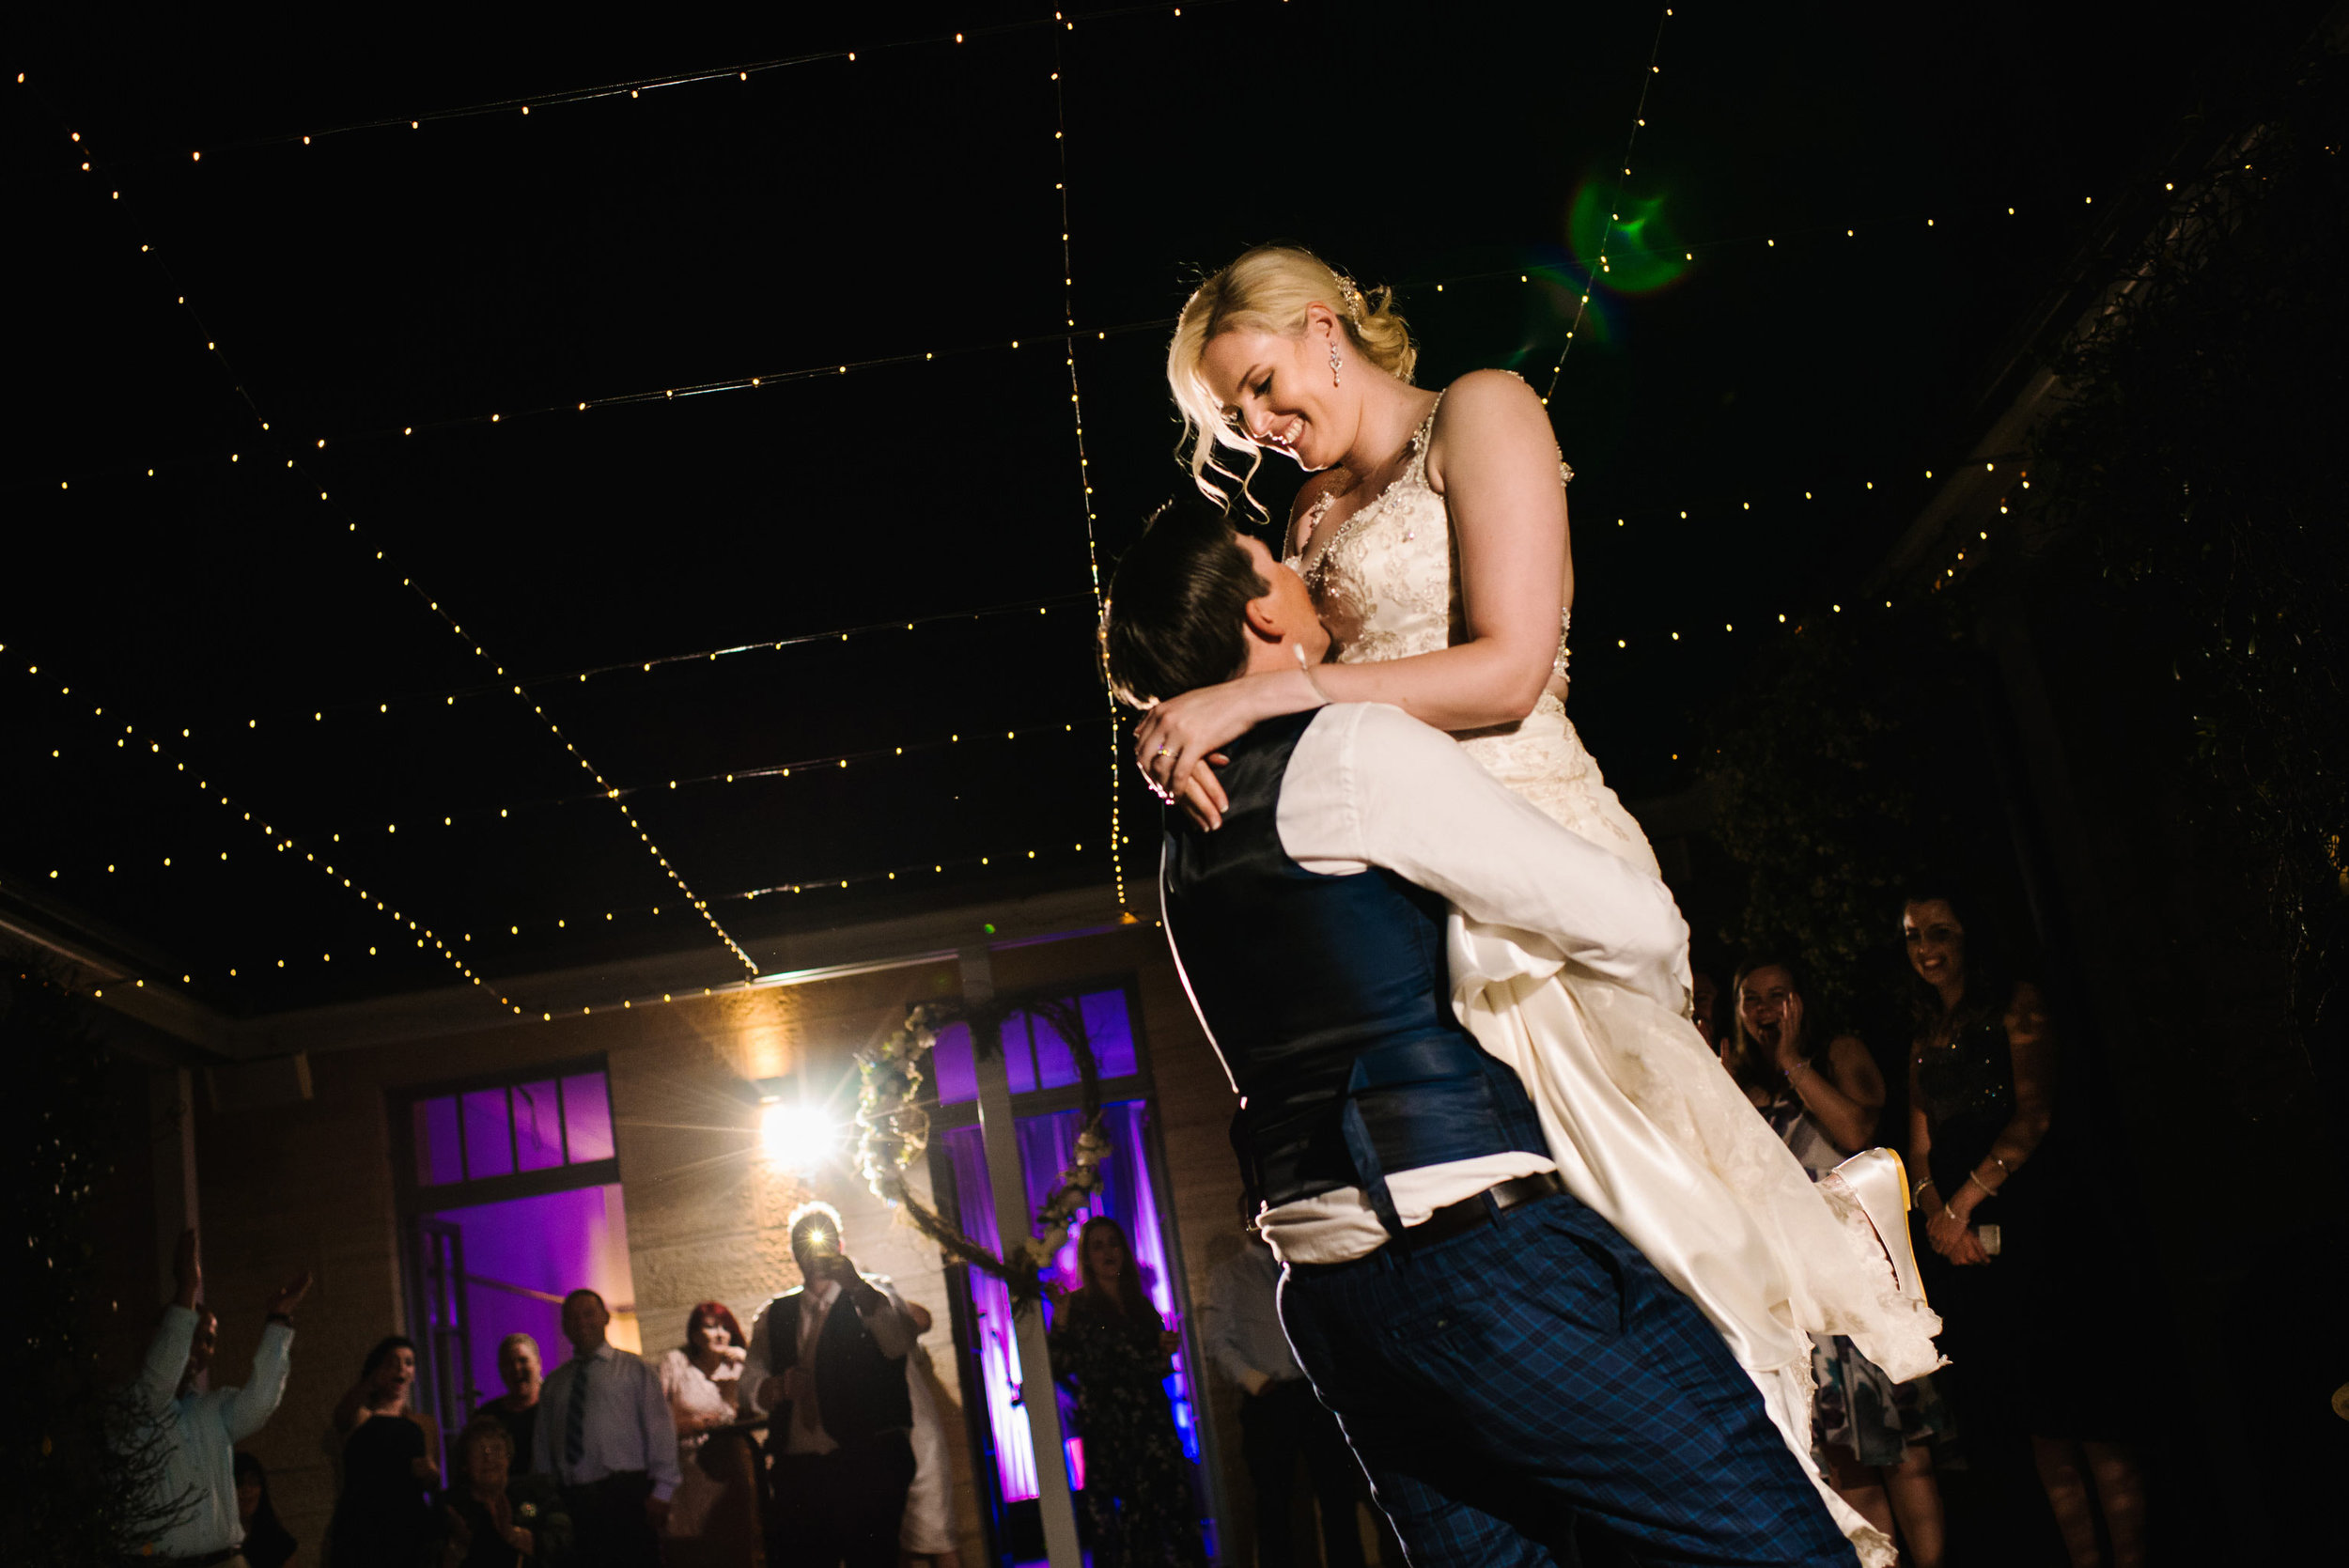 Groom lifts bride during first dance at Gunner's Barracks wedding reception